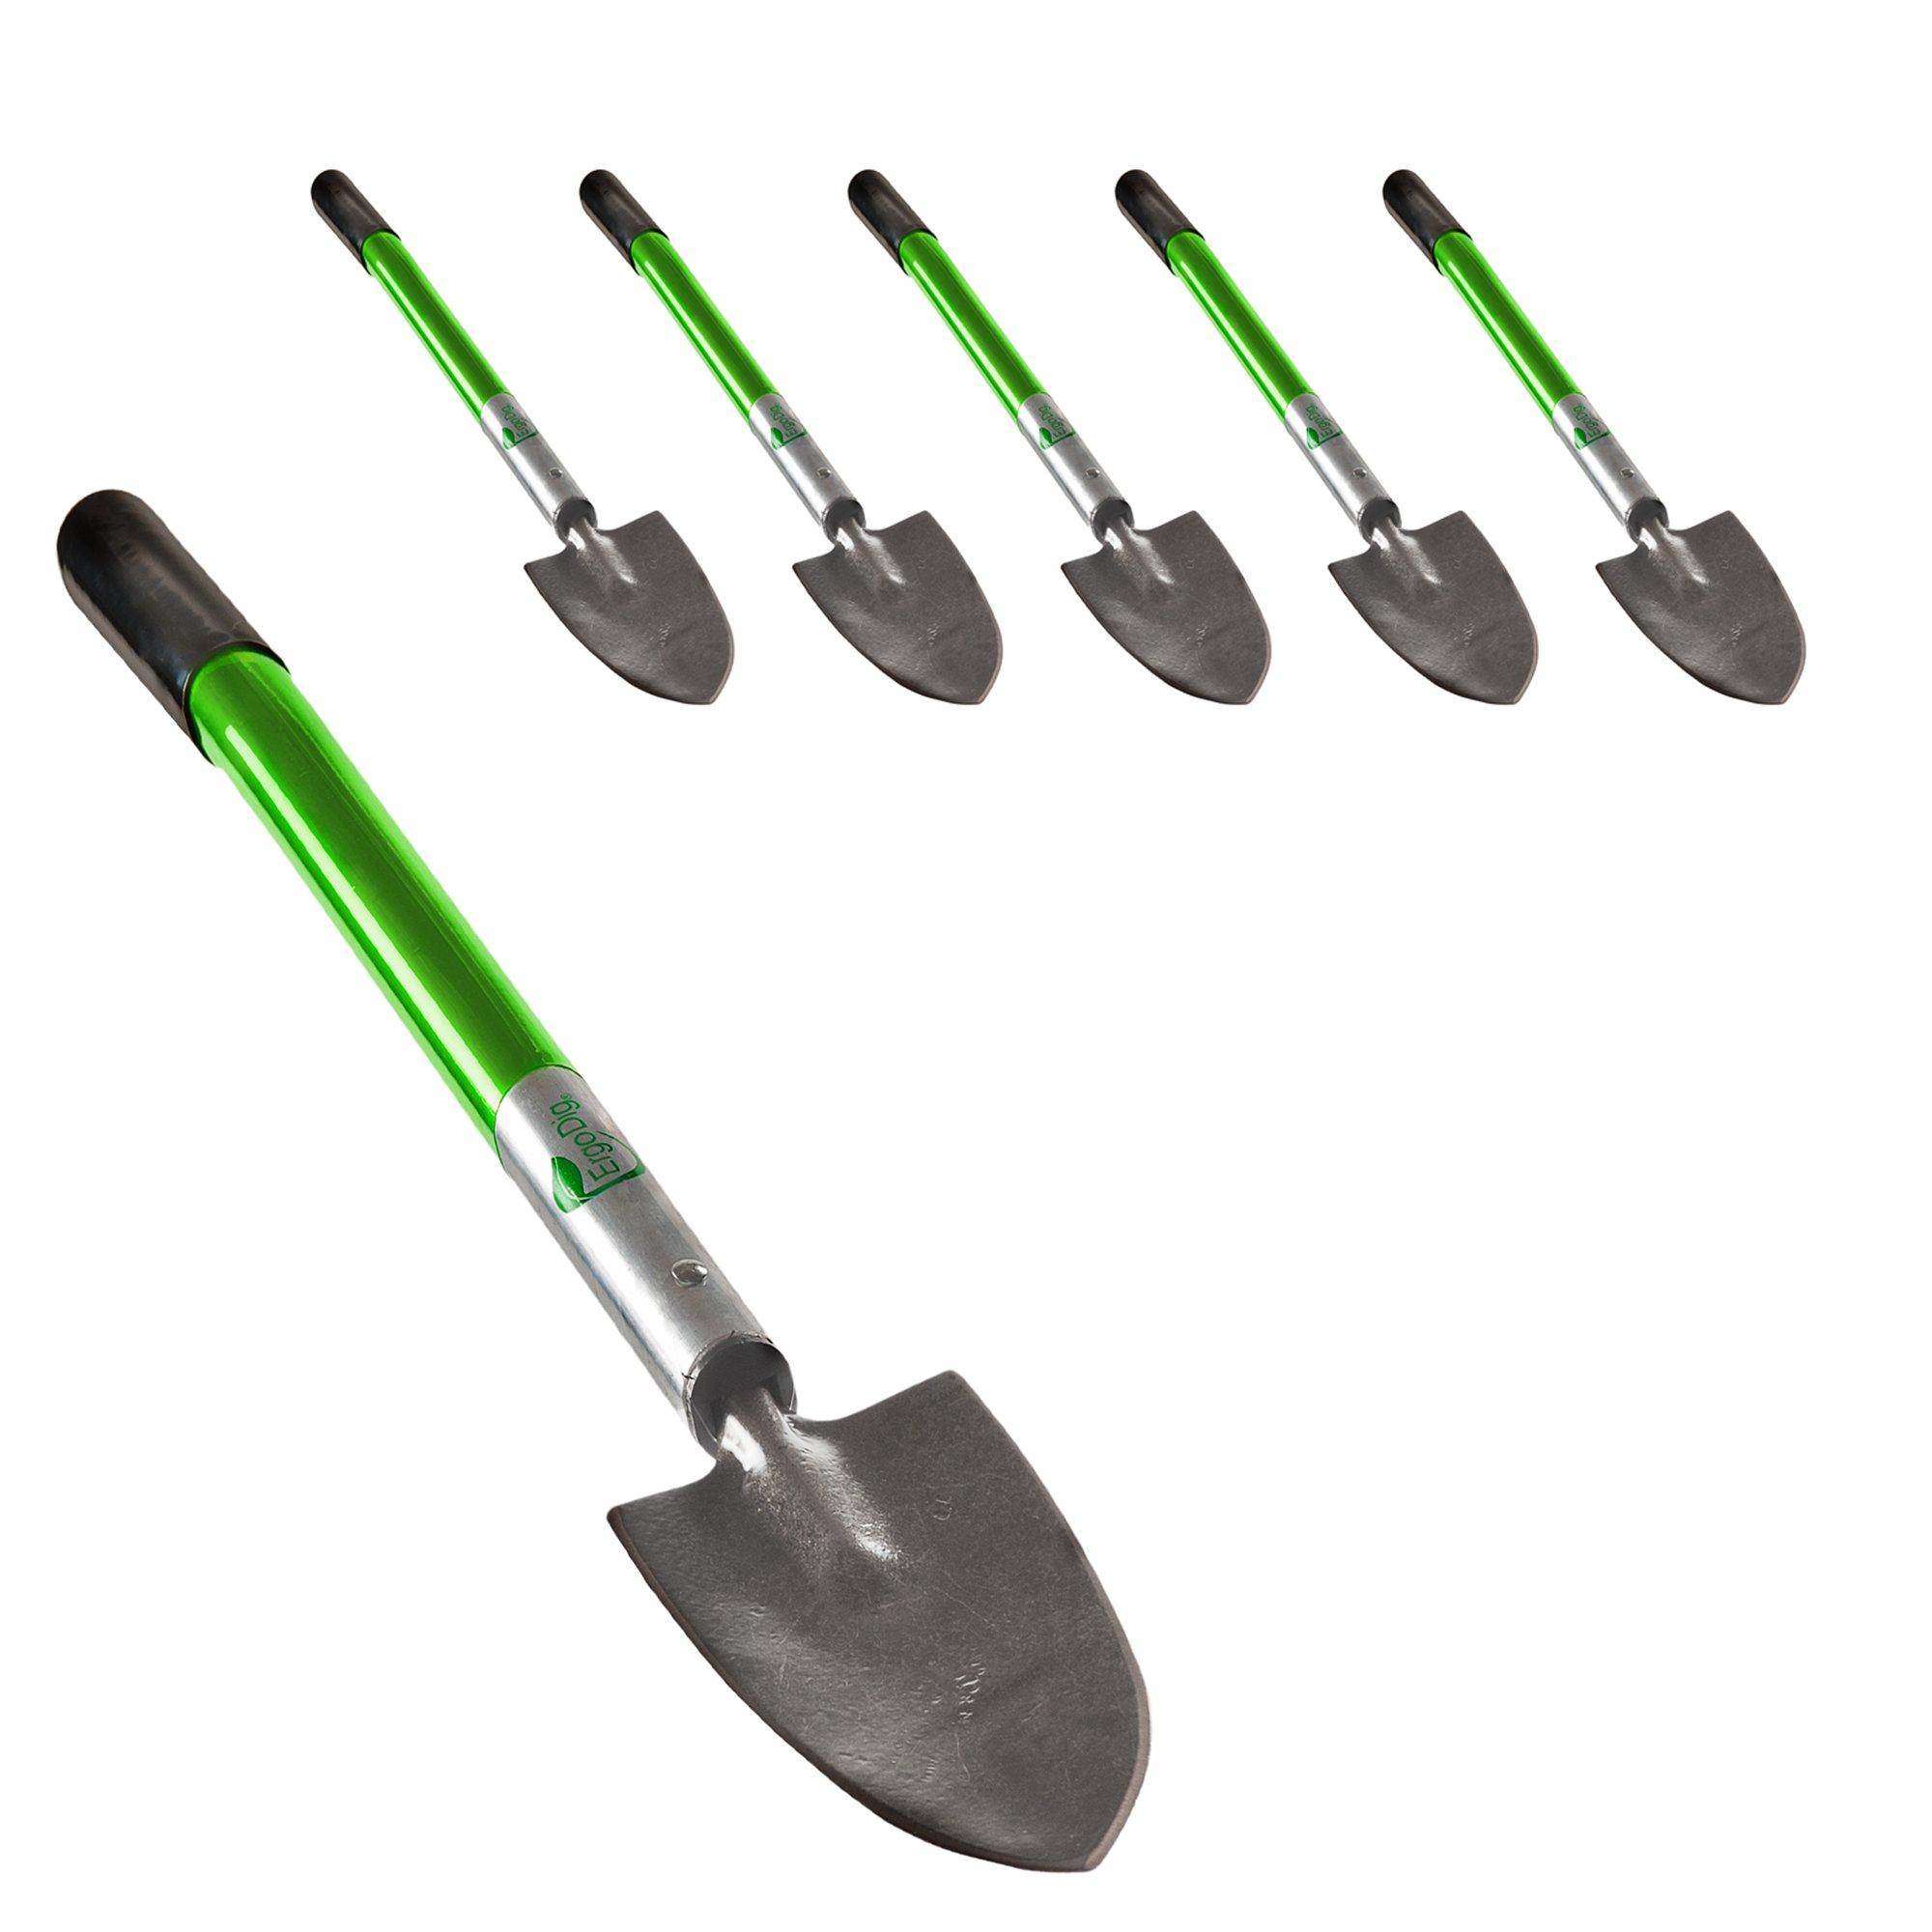 ErgoDig EP6D15007AL Lightweight Aluminum Garden Trowel with Ergonomic Handle and Soft Finger Grip, 18-Inch